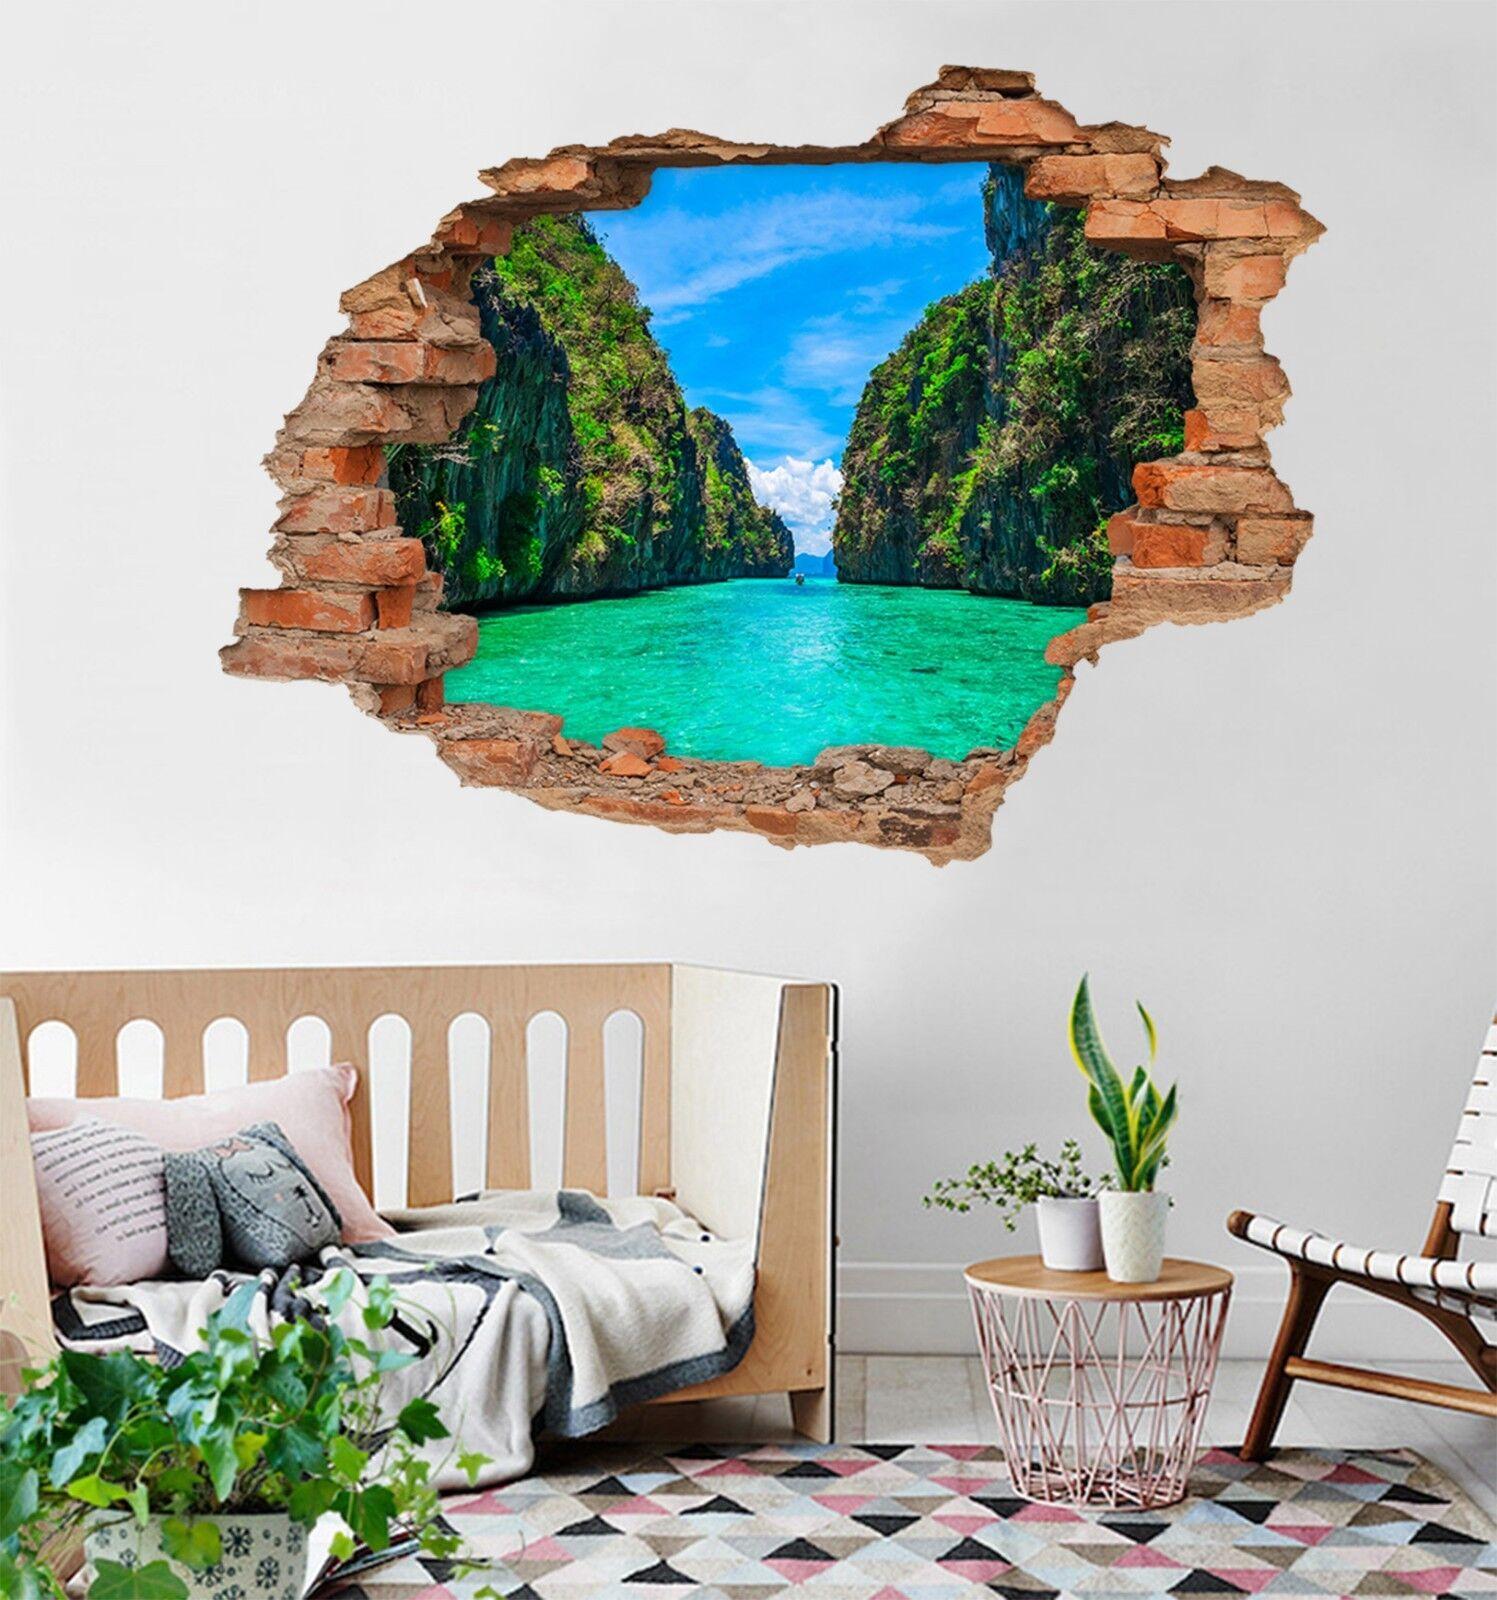 3D Canyon Grün Water 98 Wall Murals Wall Stickers Decal Durchbruch AJ WALL CA